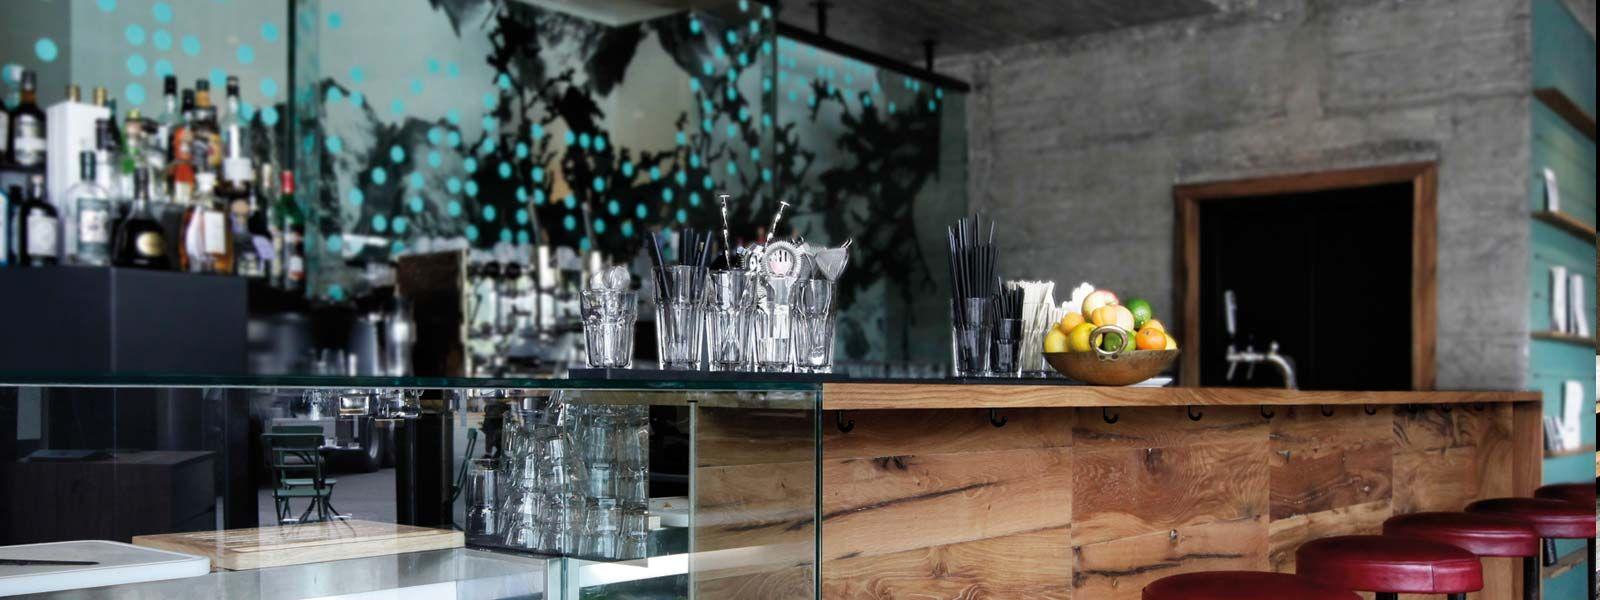 Conto Bar Gasstrasse 1, 4056 Basel Caffee